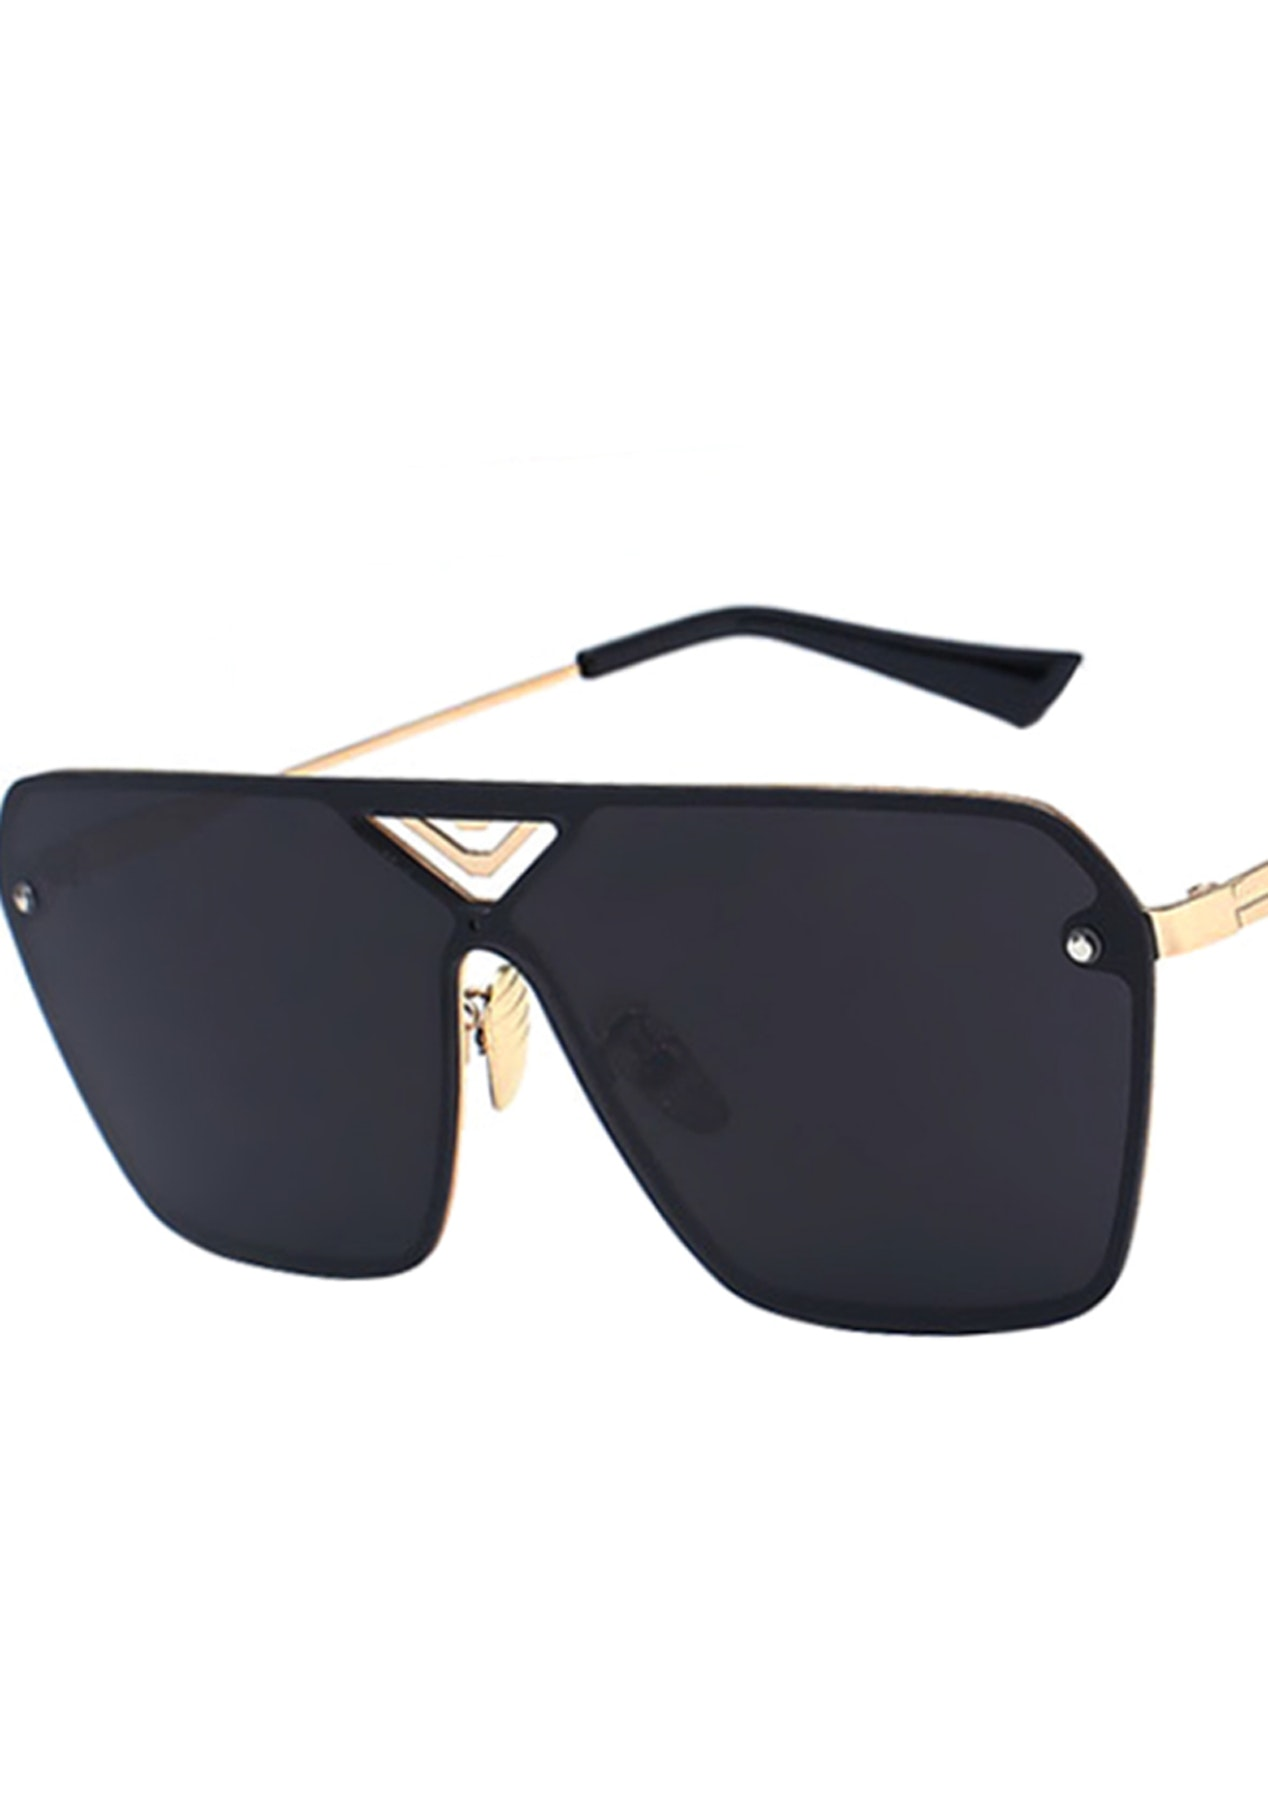 935ff465c32 Mirina Collection - Premium  Tgif - Gold